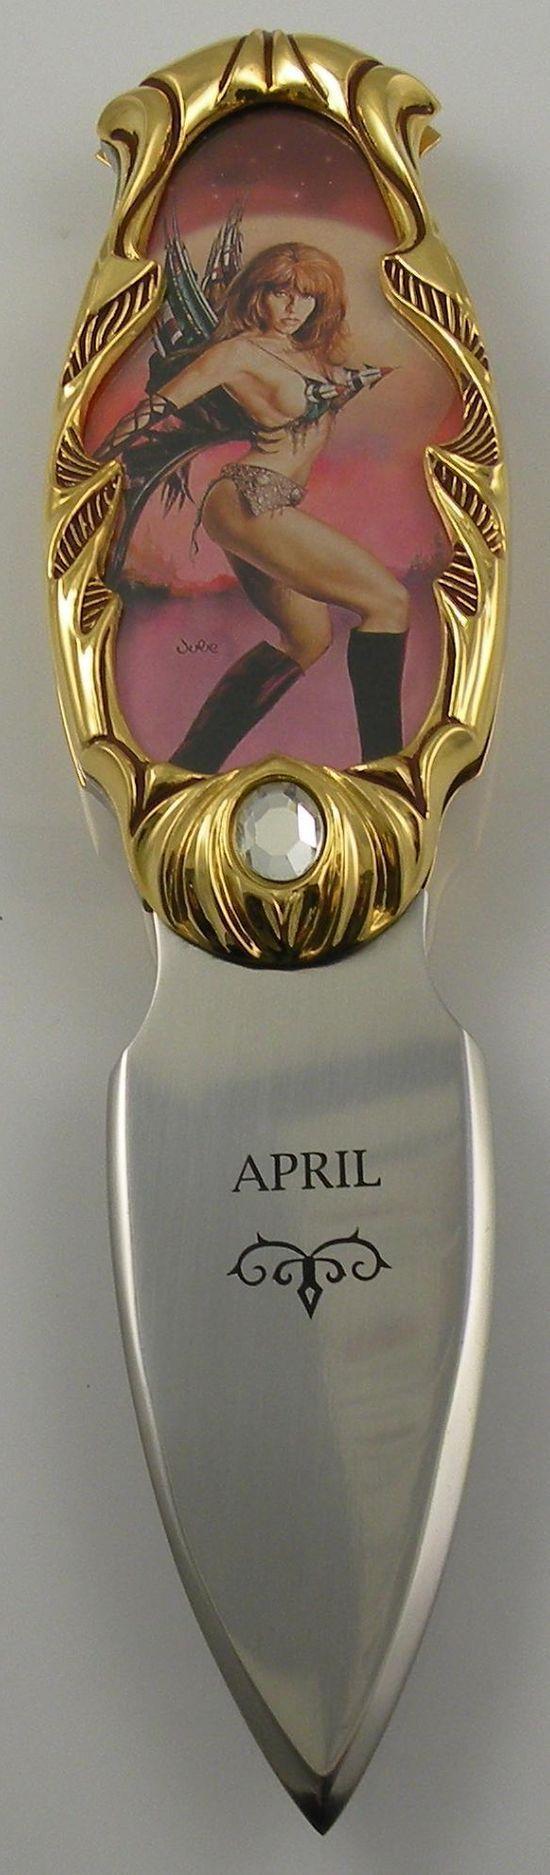 # RCFMAprilTS Franklin Mint April Calendar Girl Pocketknife